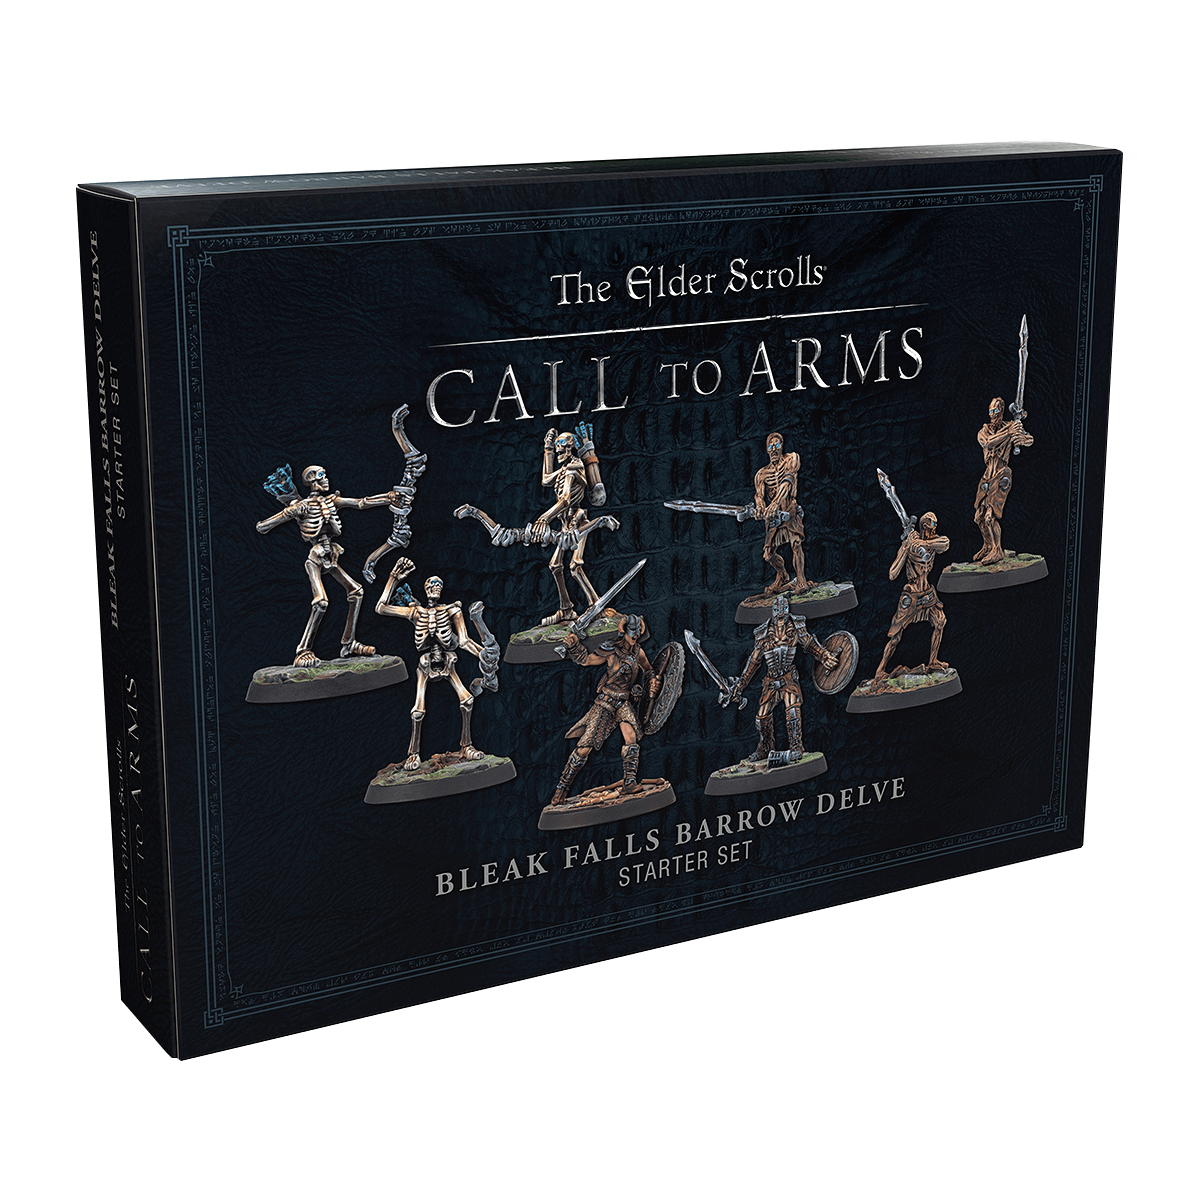 Elder Scrolls: Call to Arms - Bleak Falls Barrow Delve Set